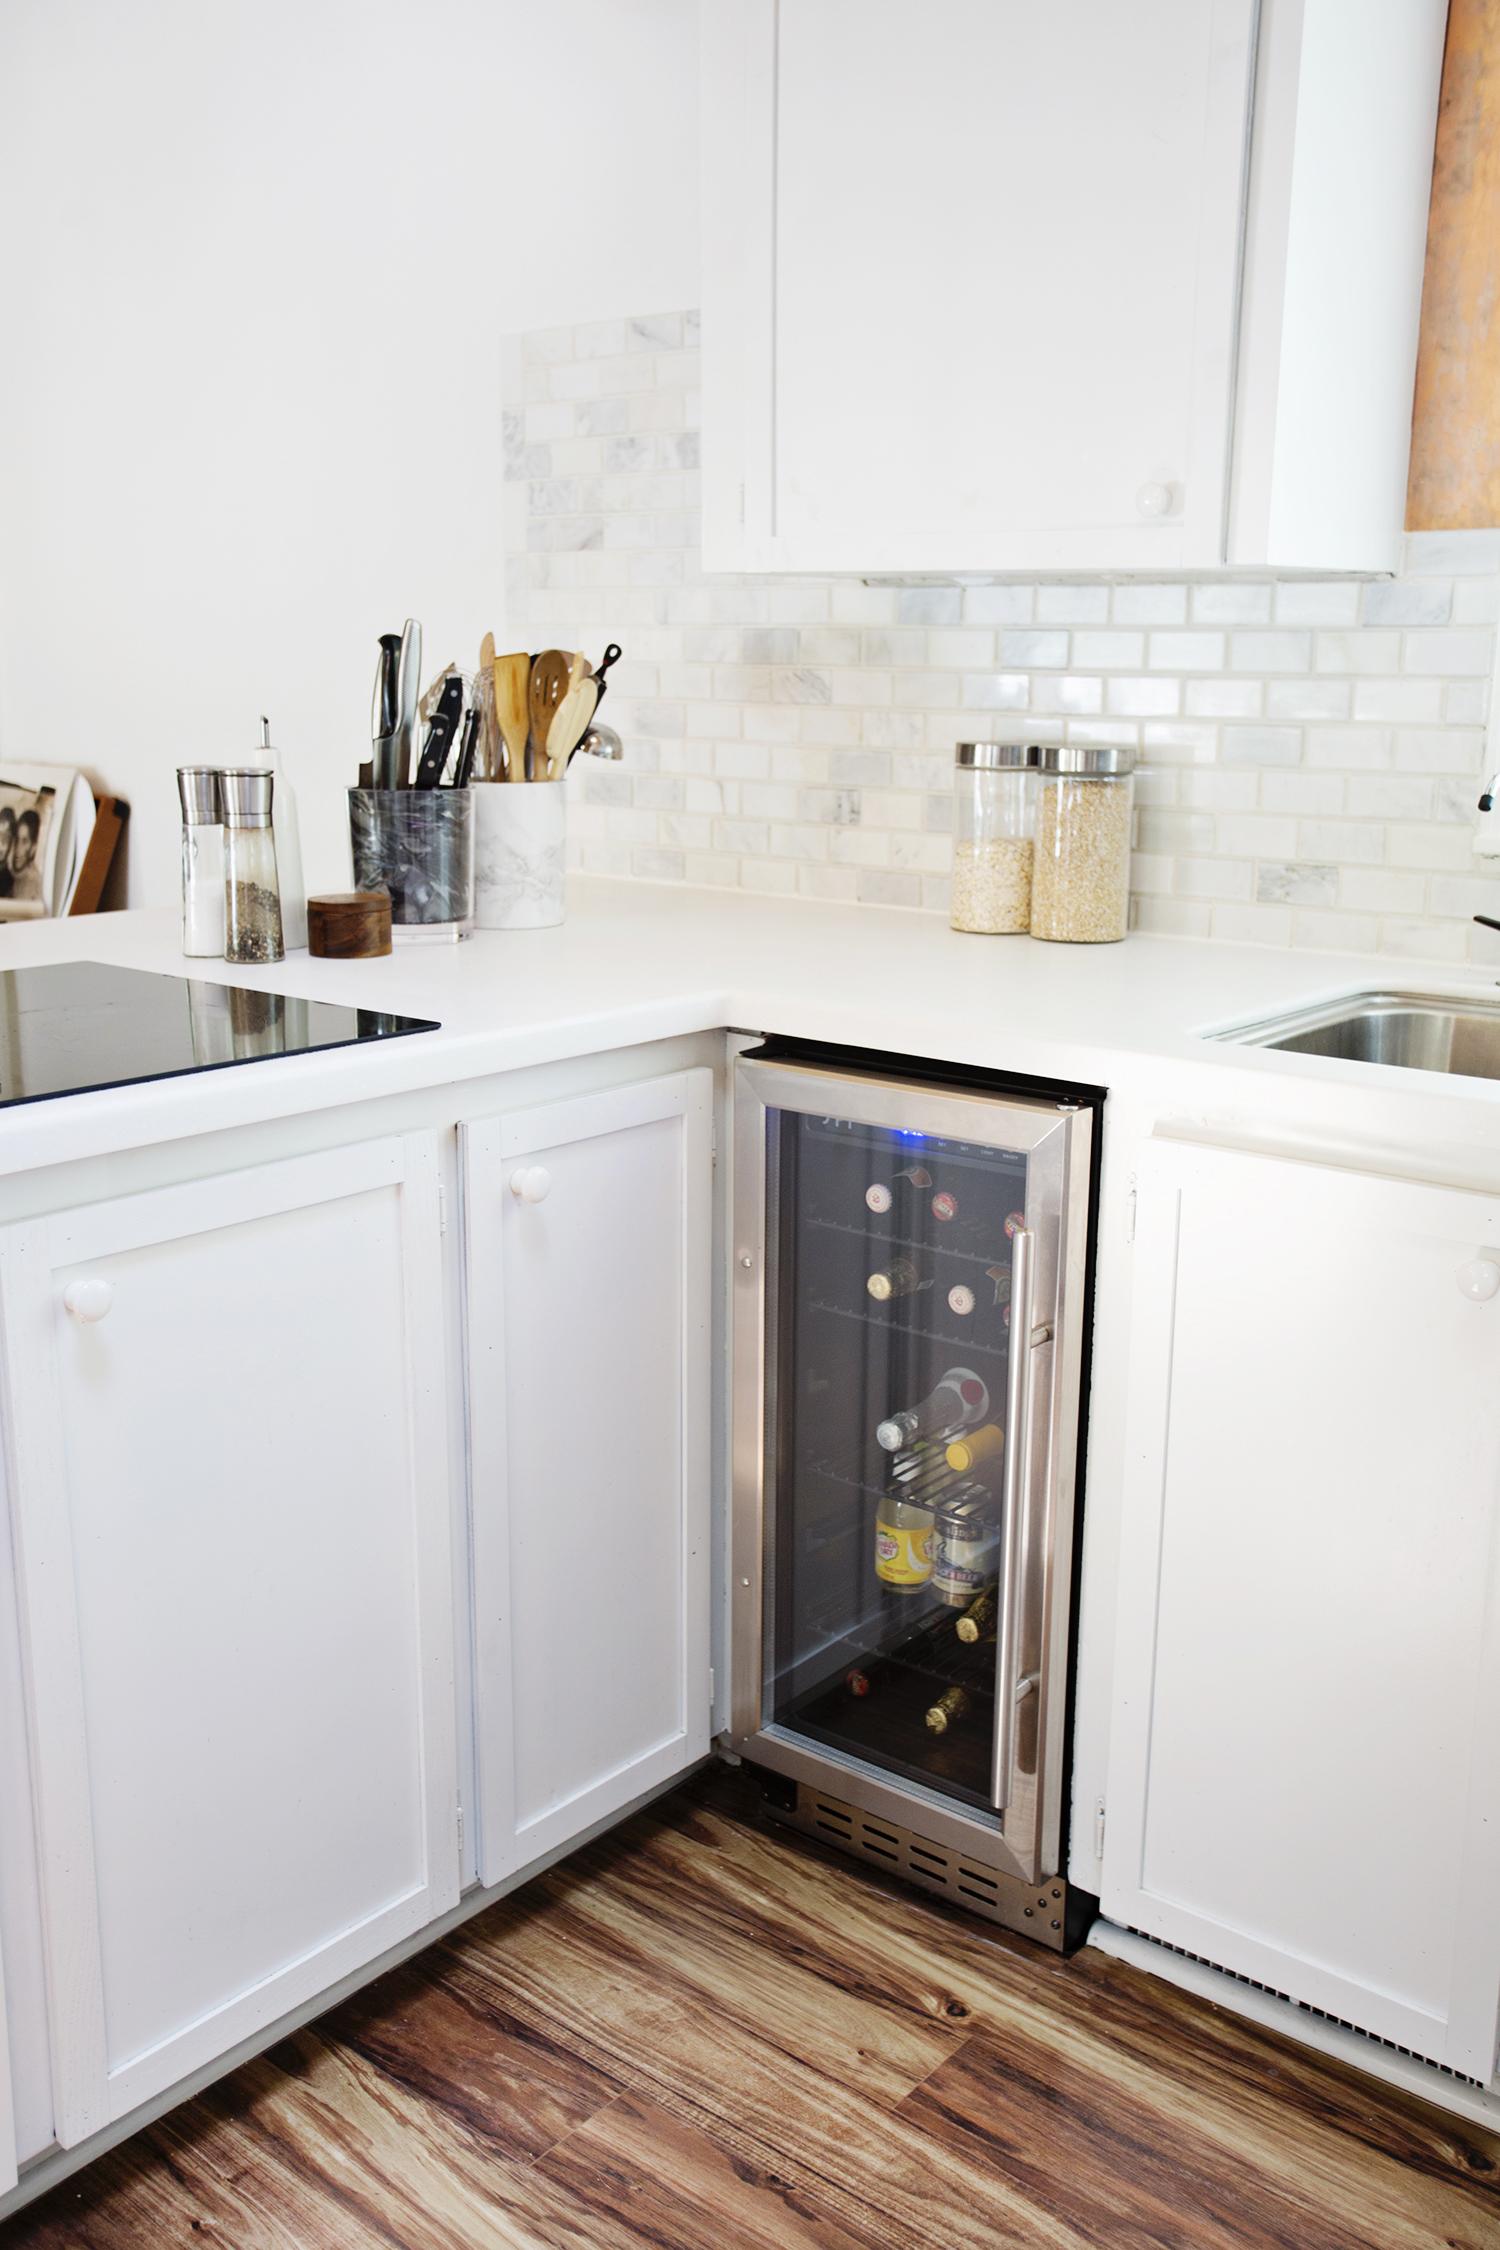 Wine and beer refrigerator